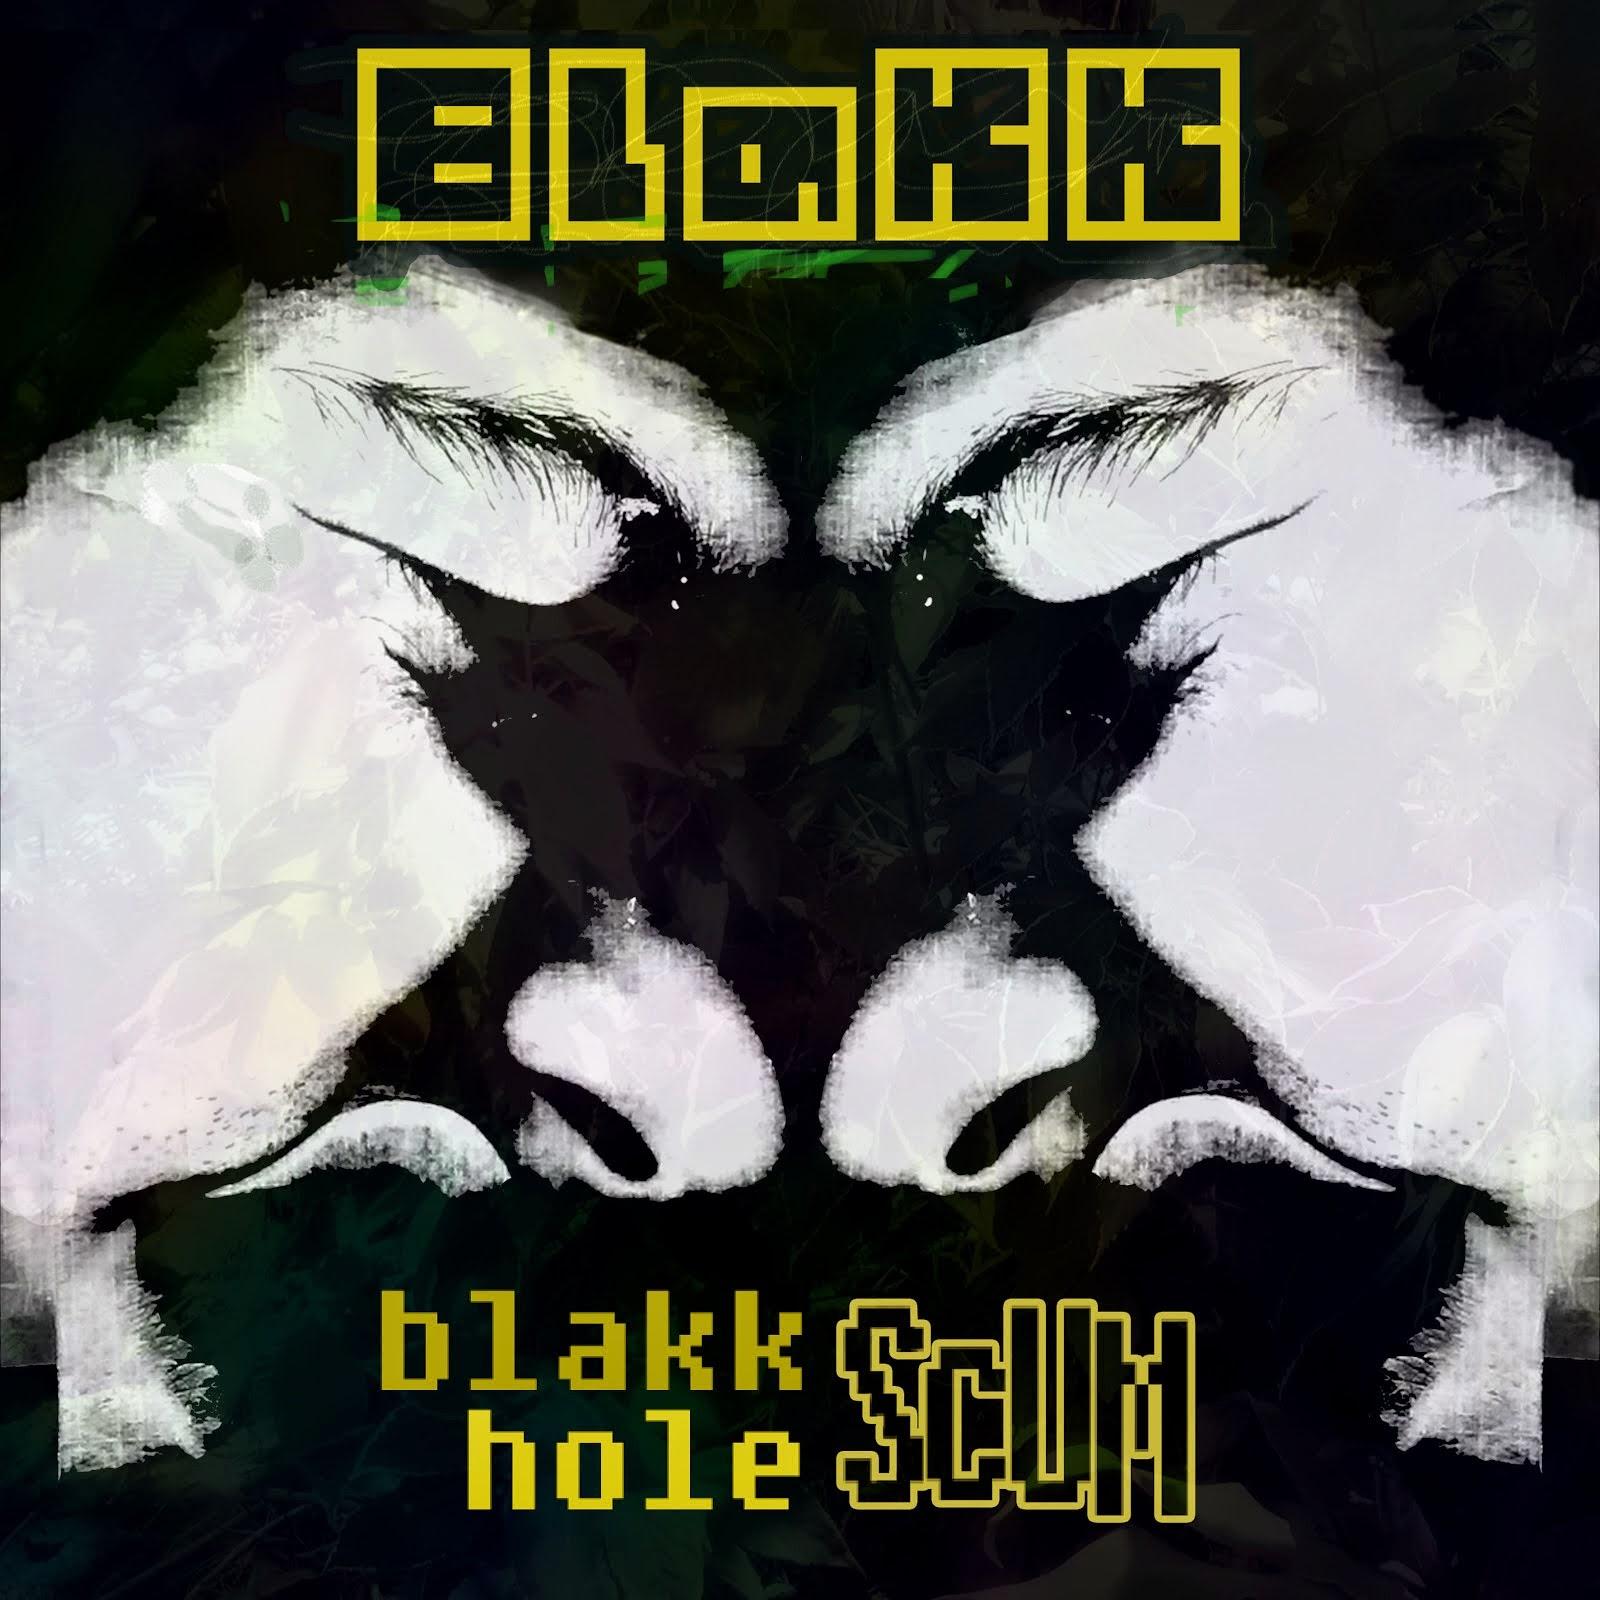 BlaKk - Blakk Hole Scum EP (TIO019)